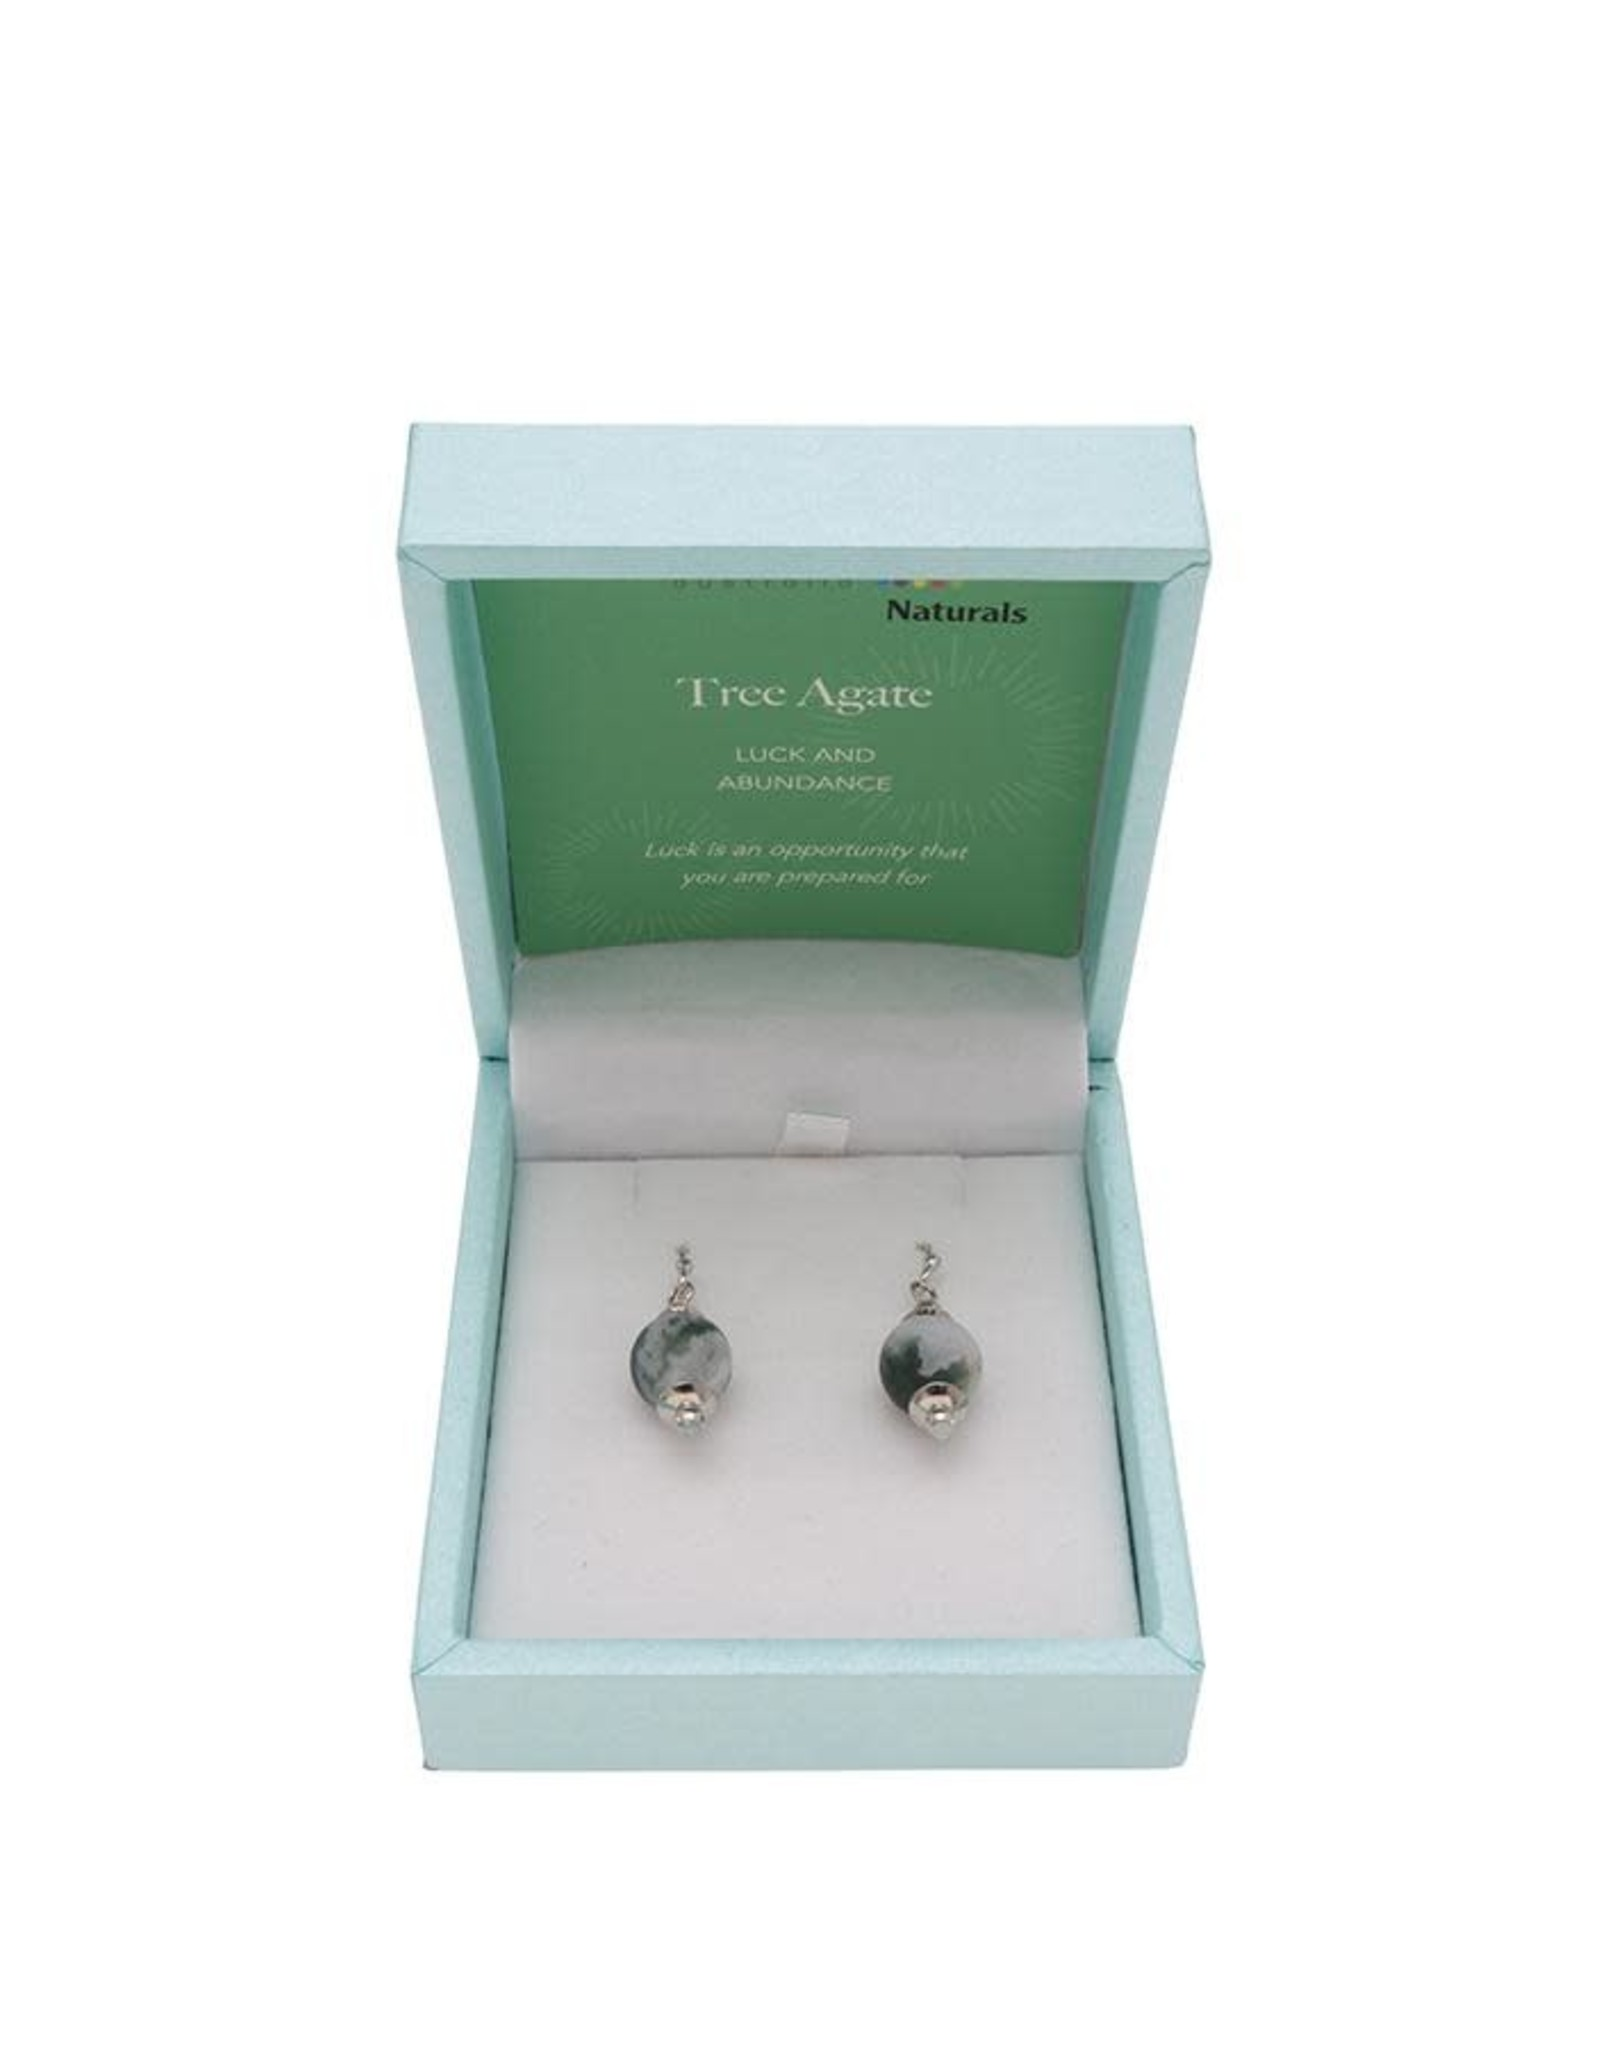 Bramble Bay & Co Crystal Carvings Natural Earrings